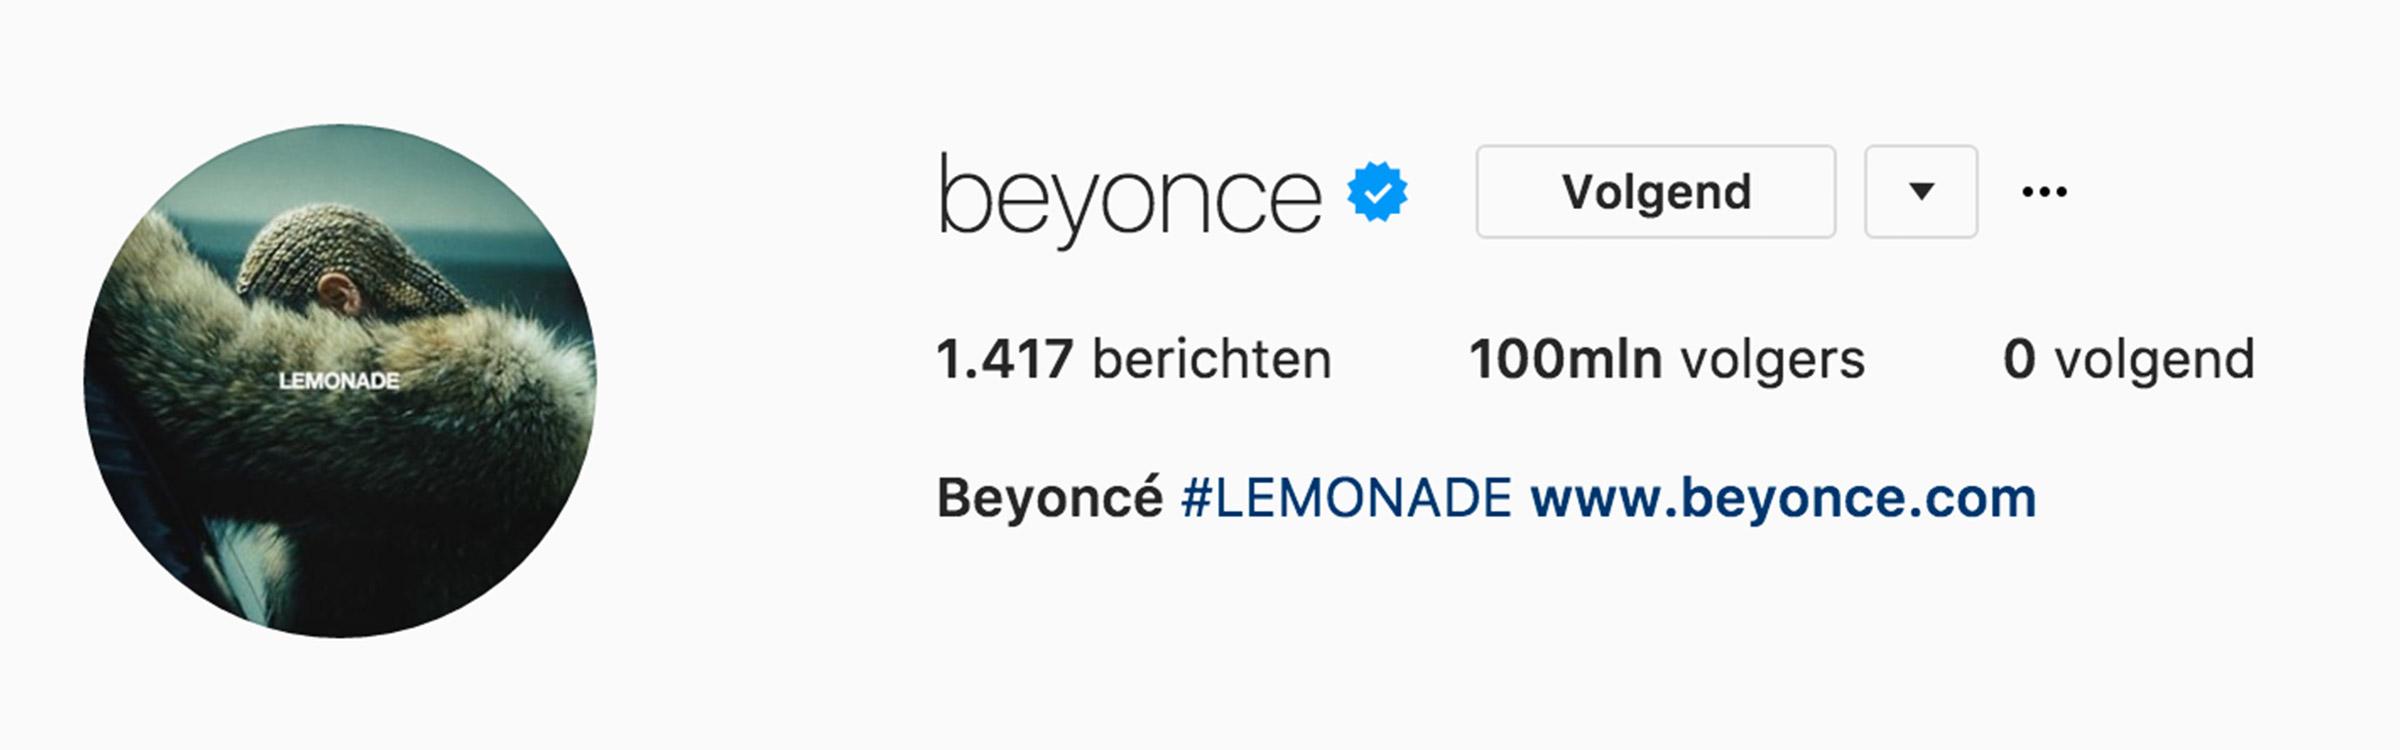 Beyonce insta header